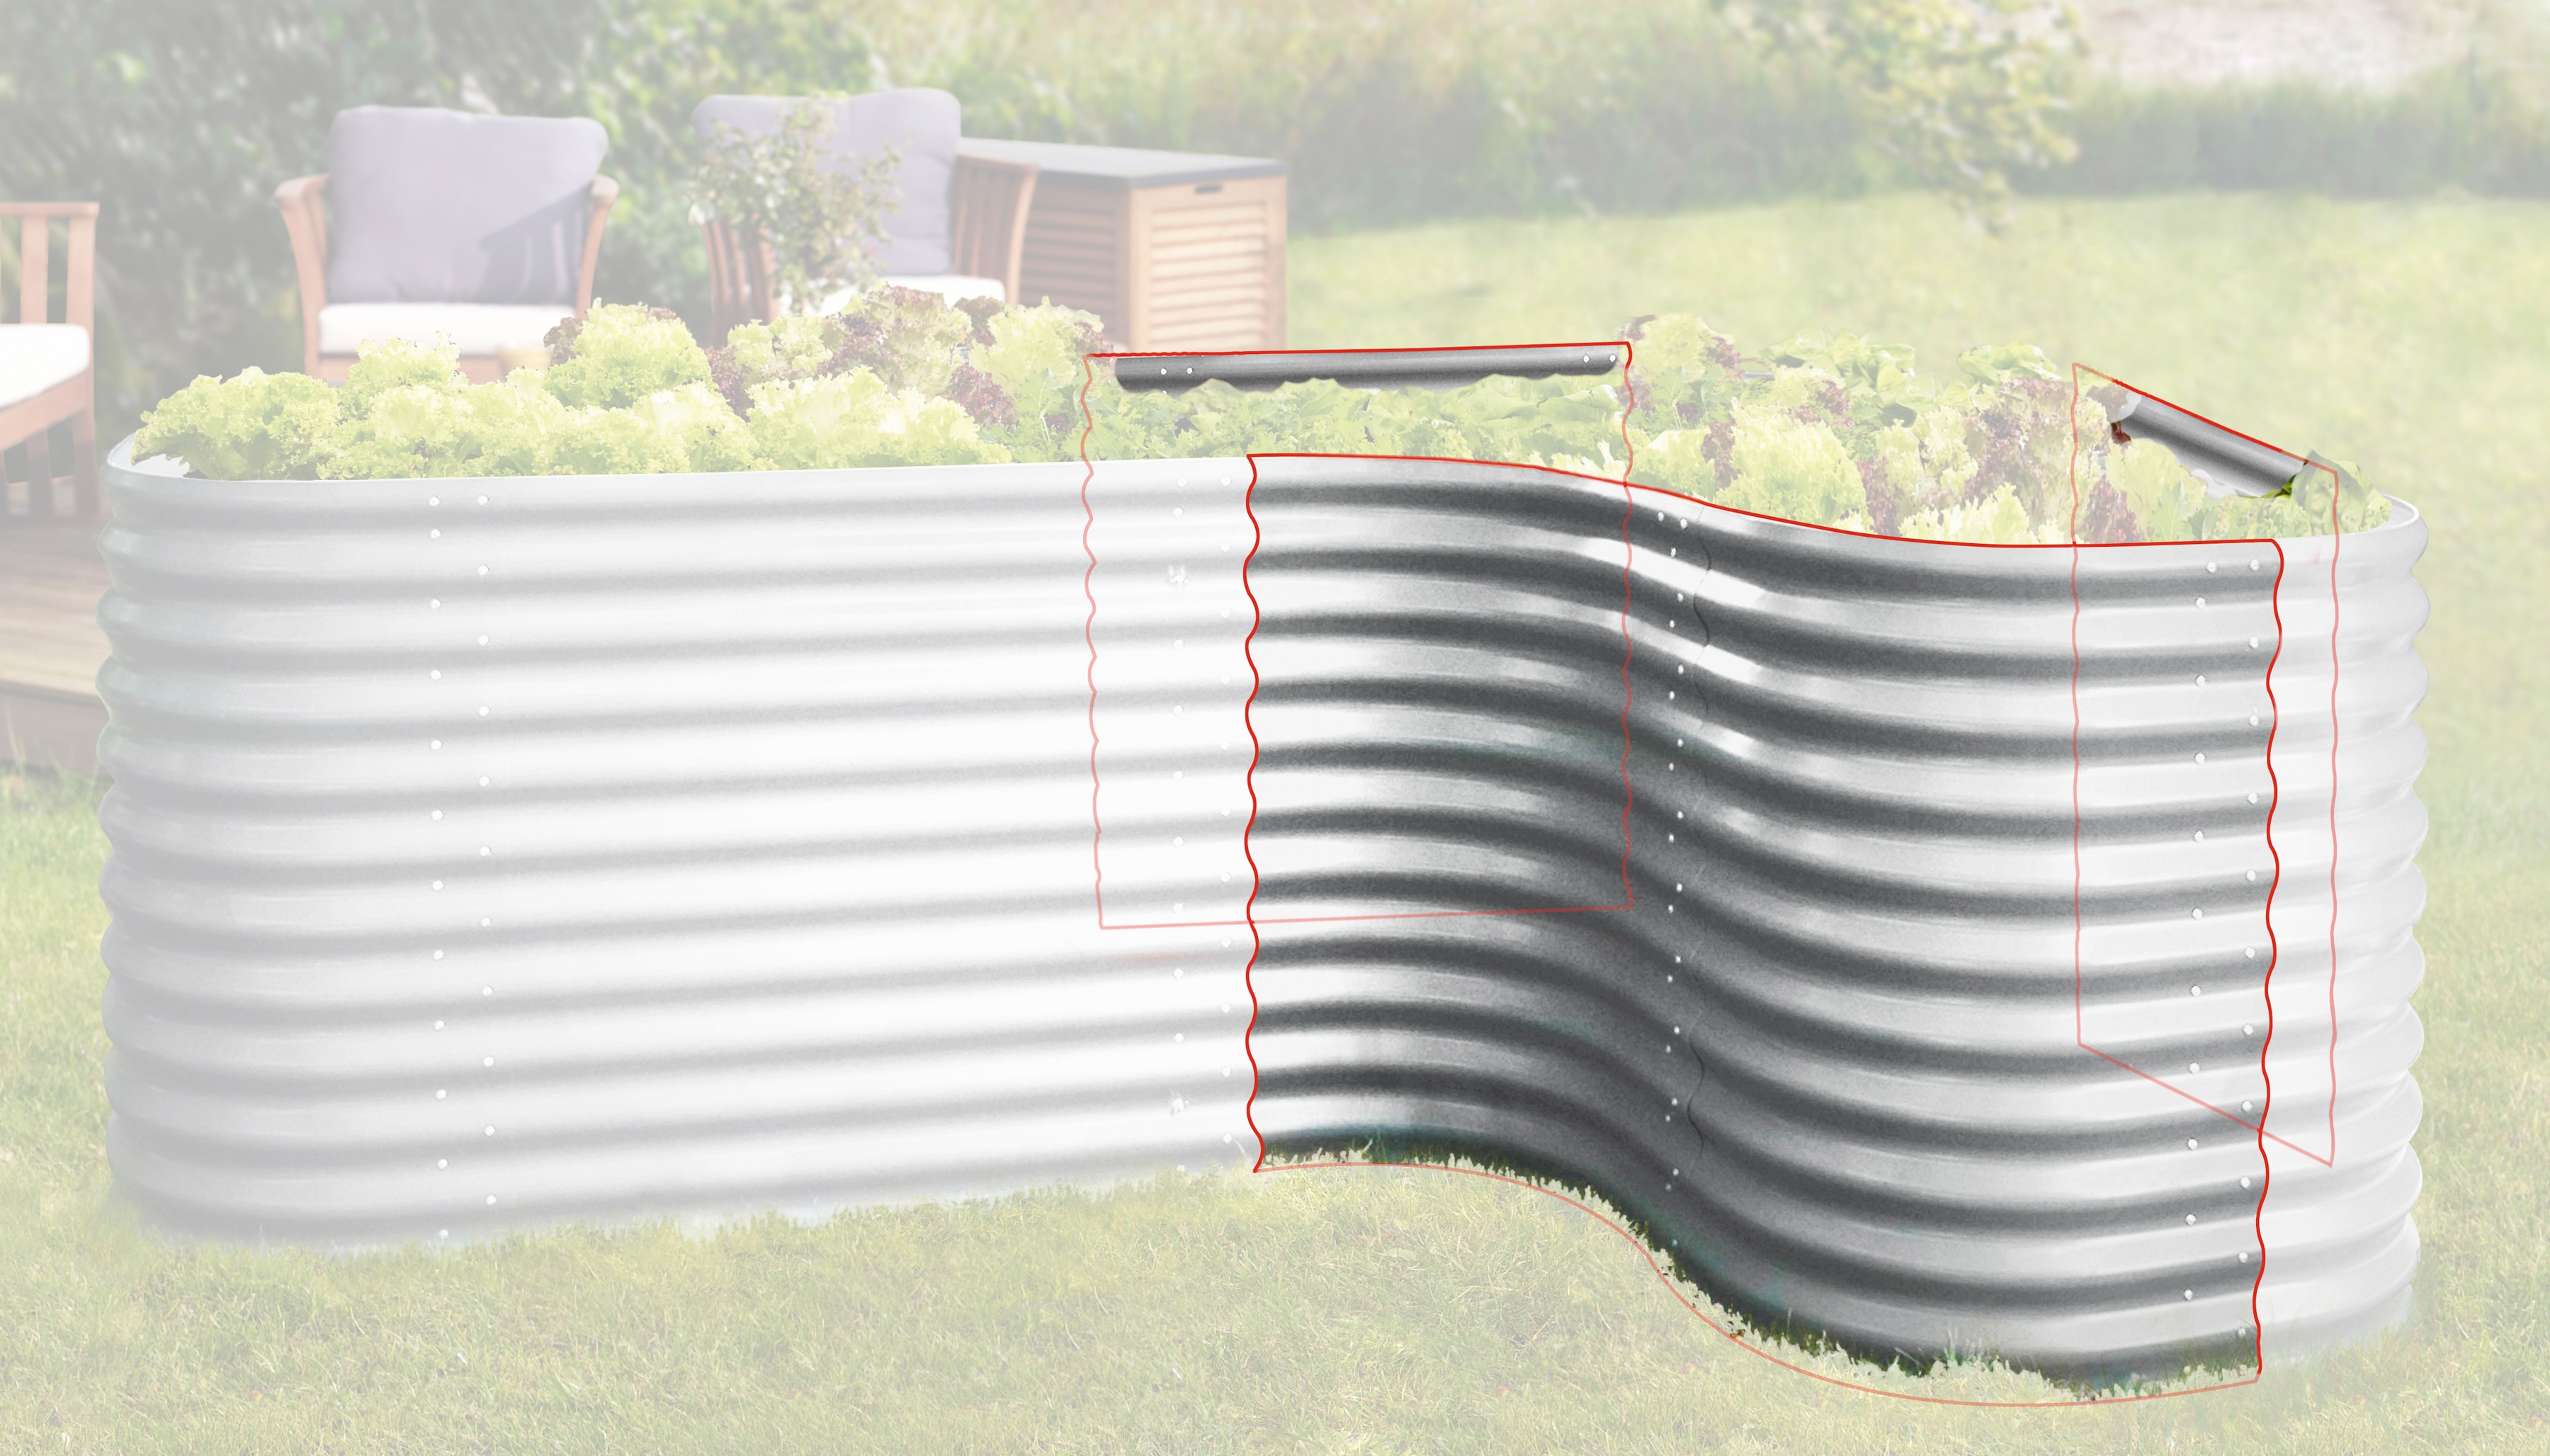 Hochbeet-Lxbxh-80X80X86-Cm-Aluminiumfarben-Vitavia-Hochbeete-Zubehoer Indexbild 3